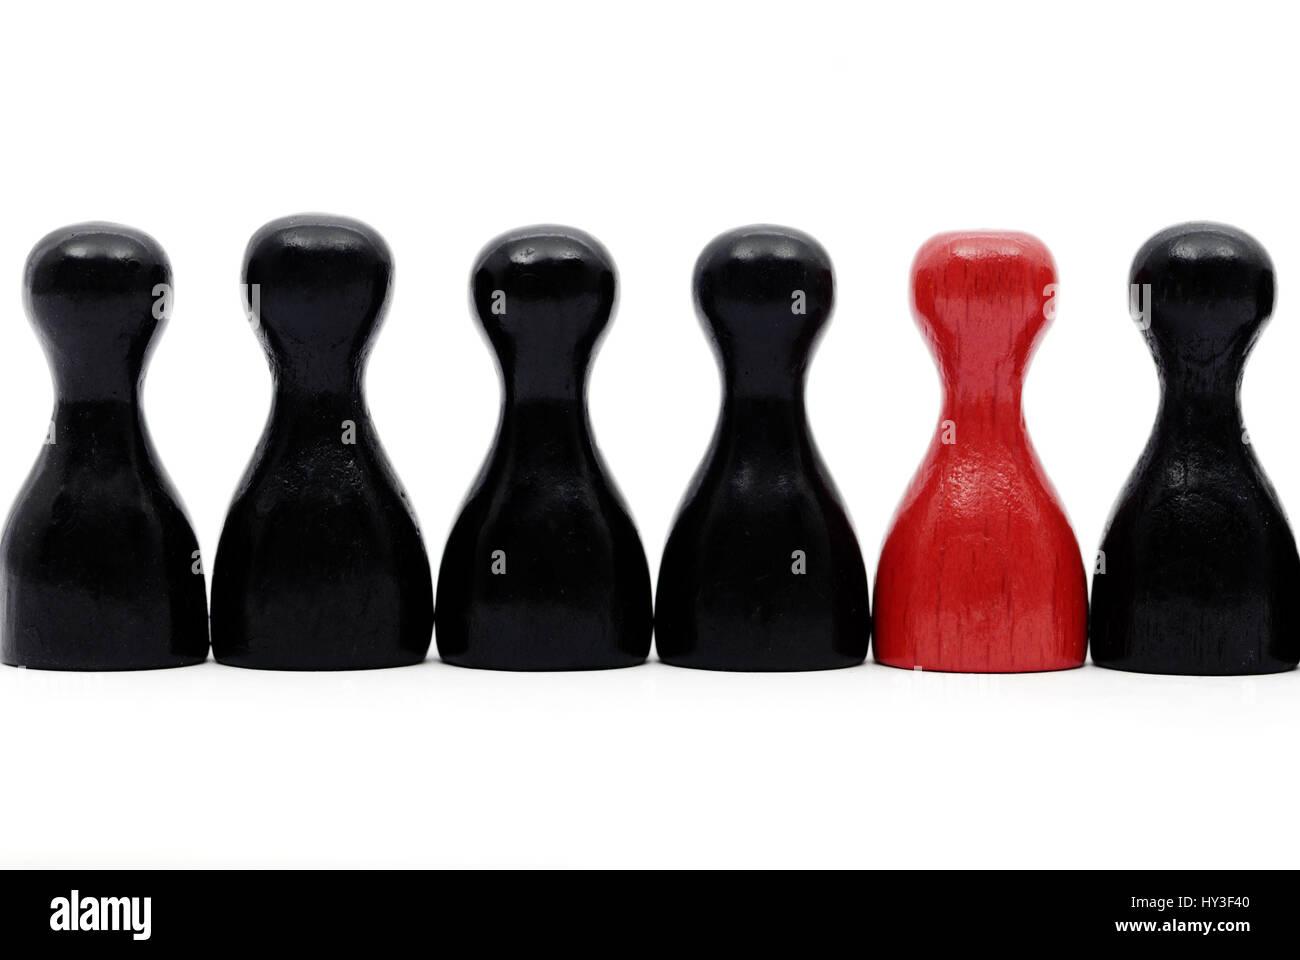 Red play figure in the midst of black play figures, Rote Spielfigur inmitten von schwarzen Spielfiguren - Stock Image